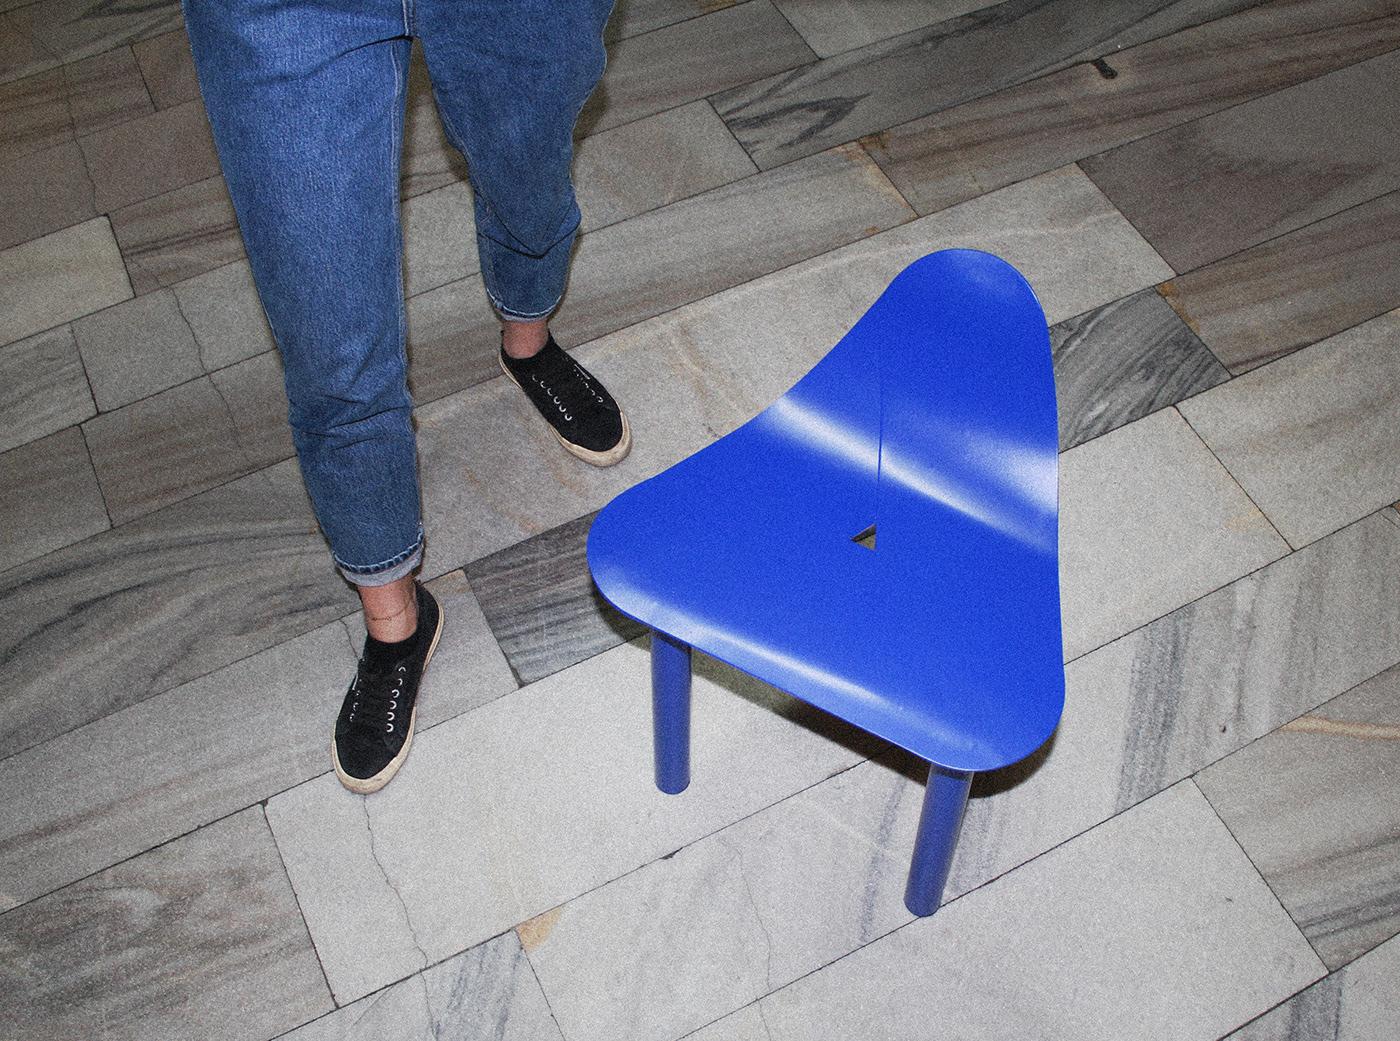 aluminium chair blue chair Craftmanship design furniture industrialdesign Marble METALFURNITURE stool